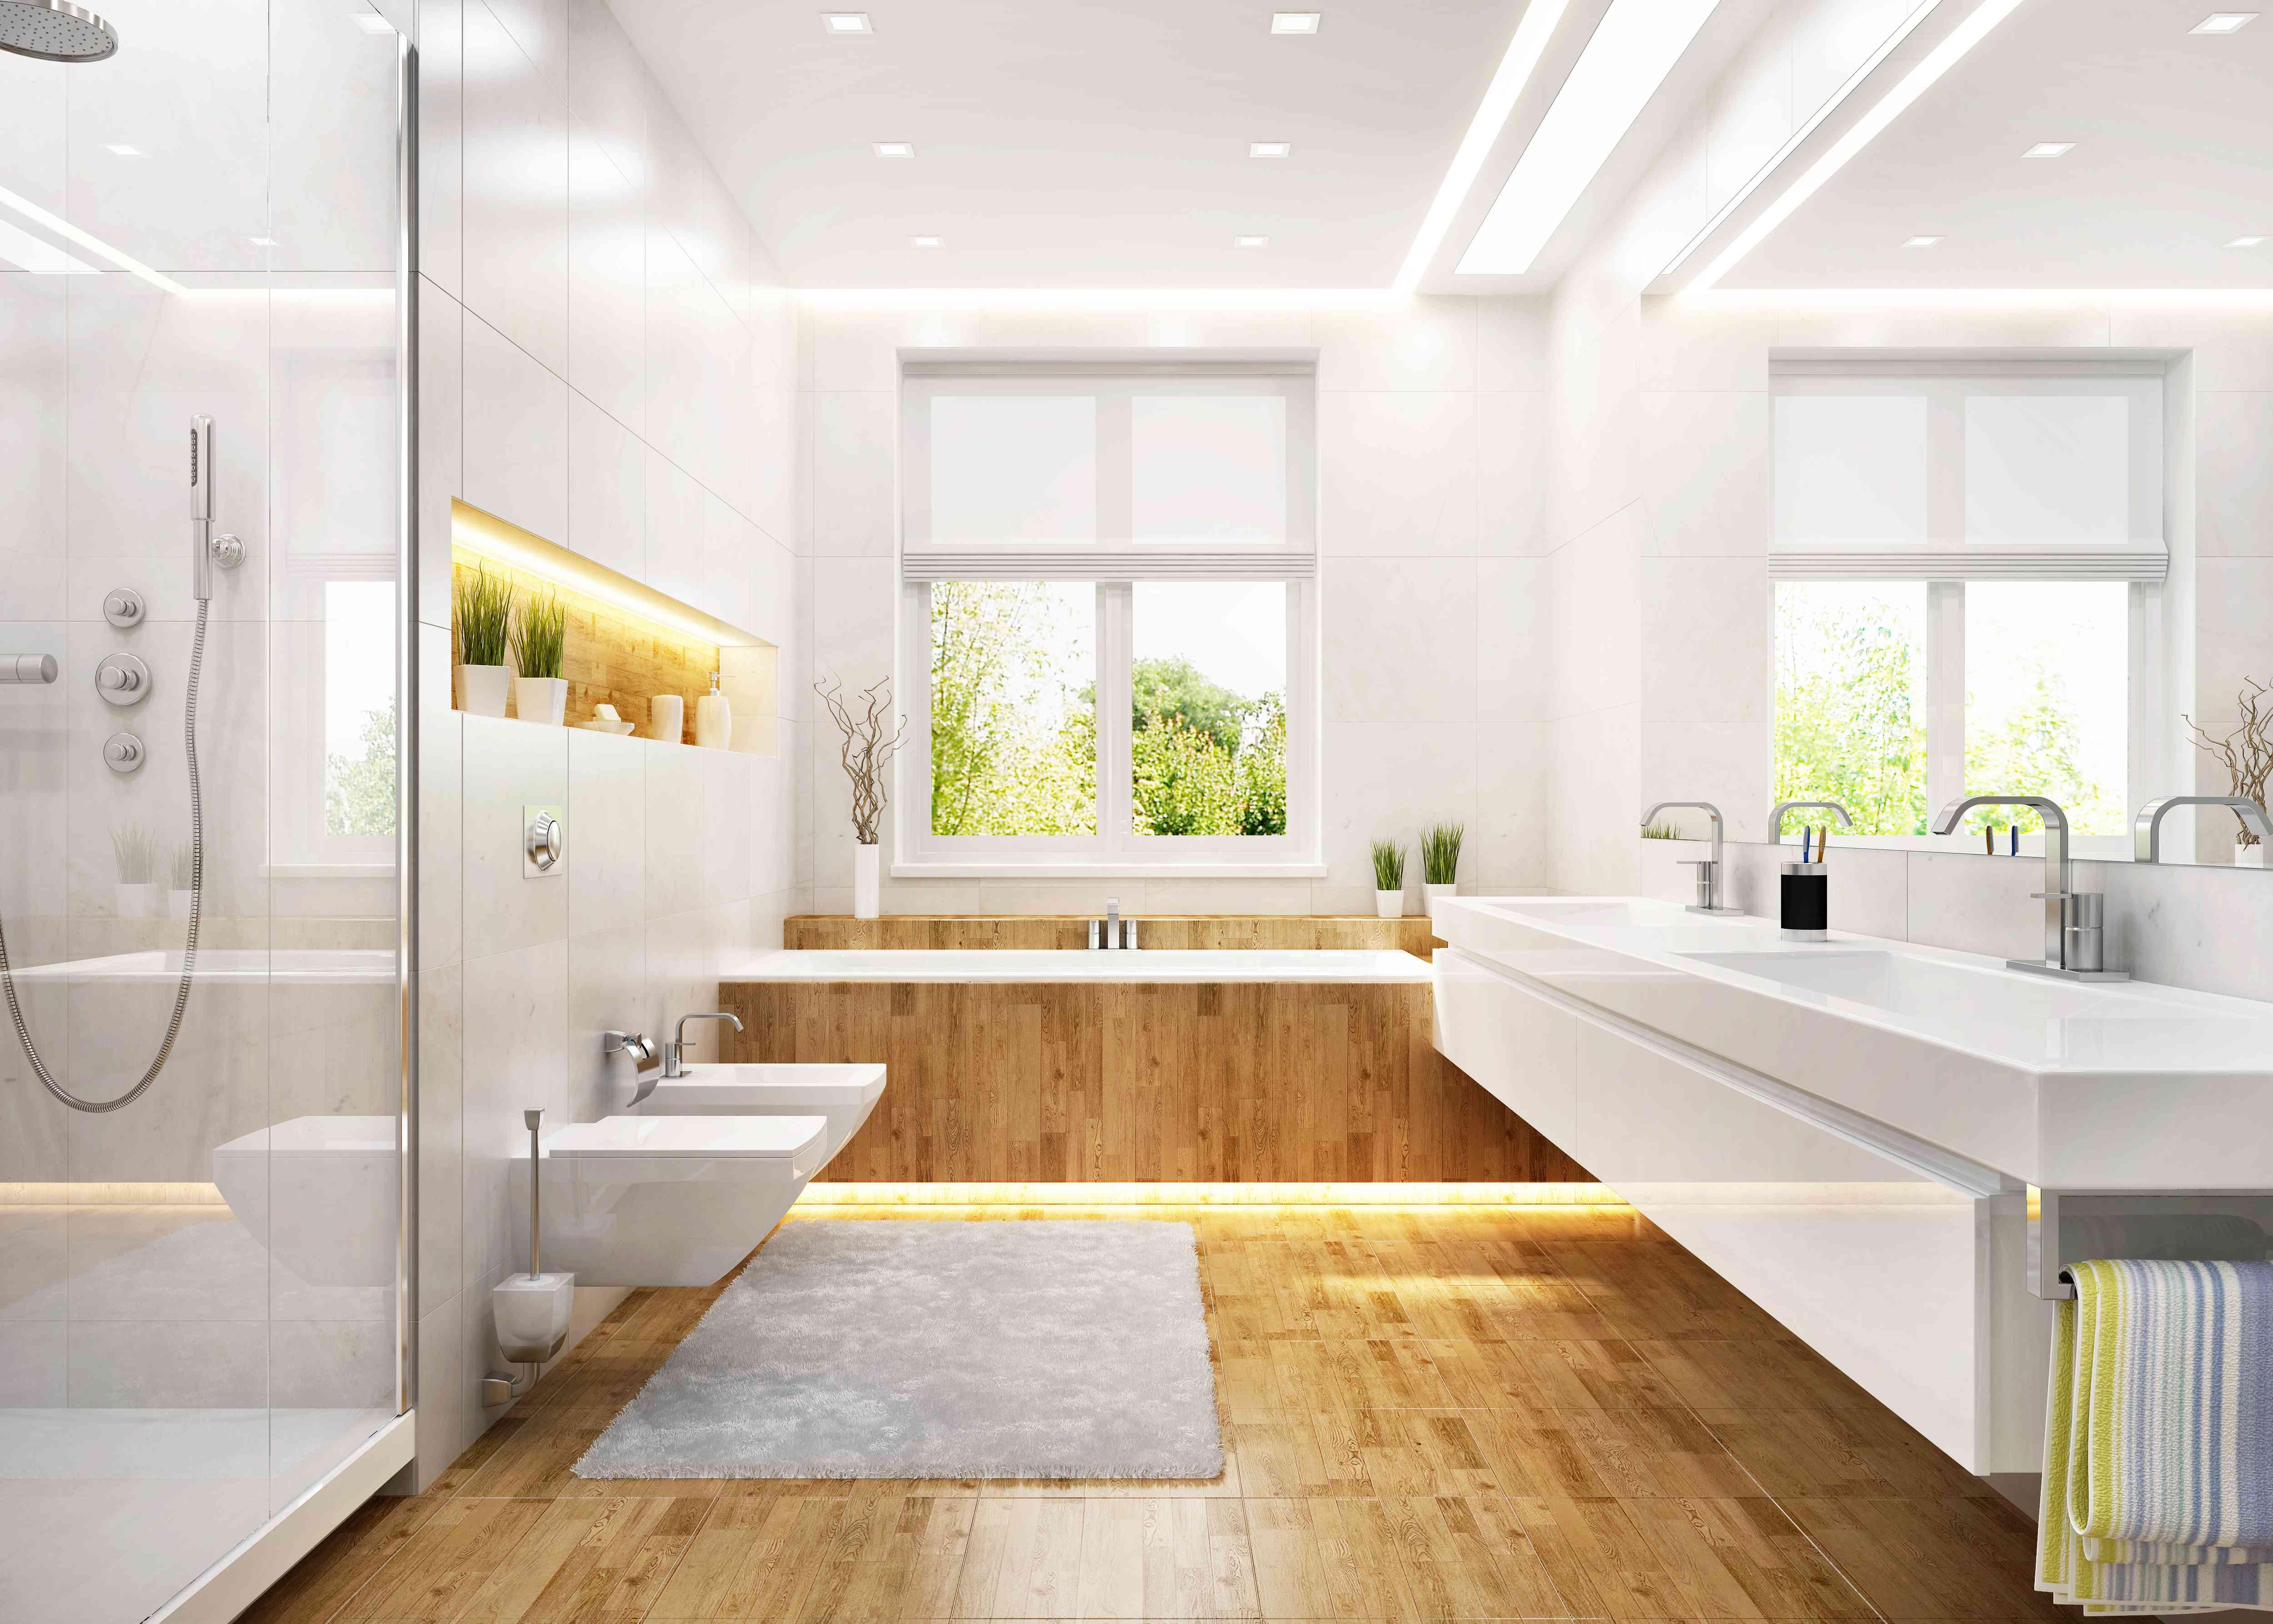 Luxury white bathroom in modern house